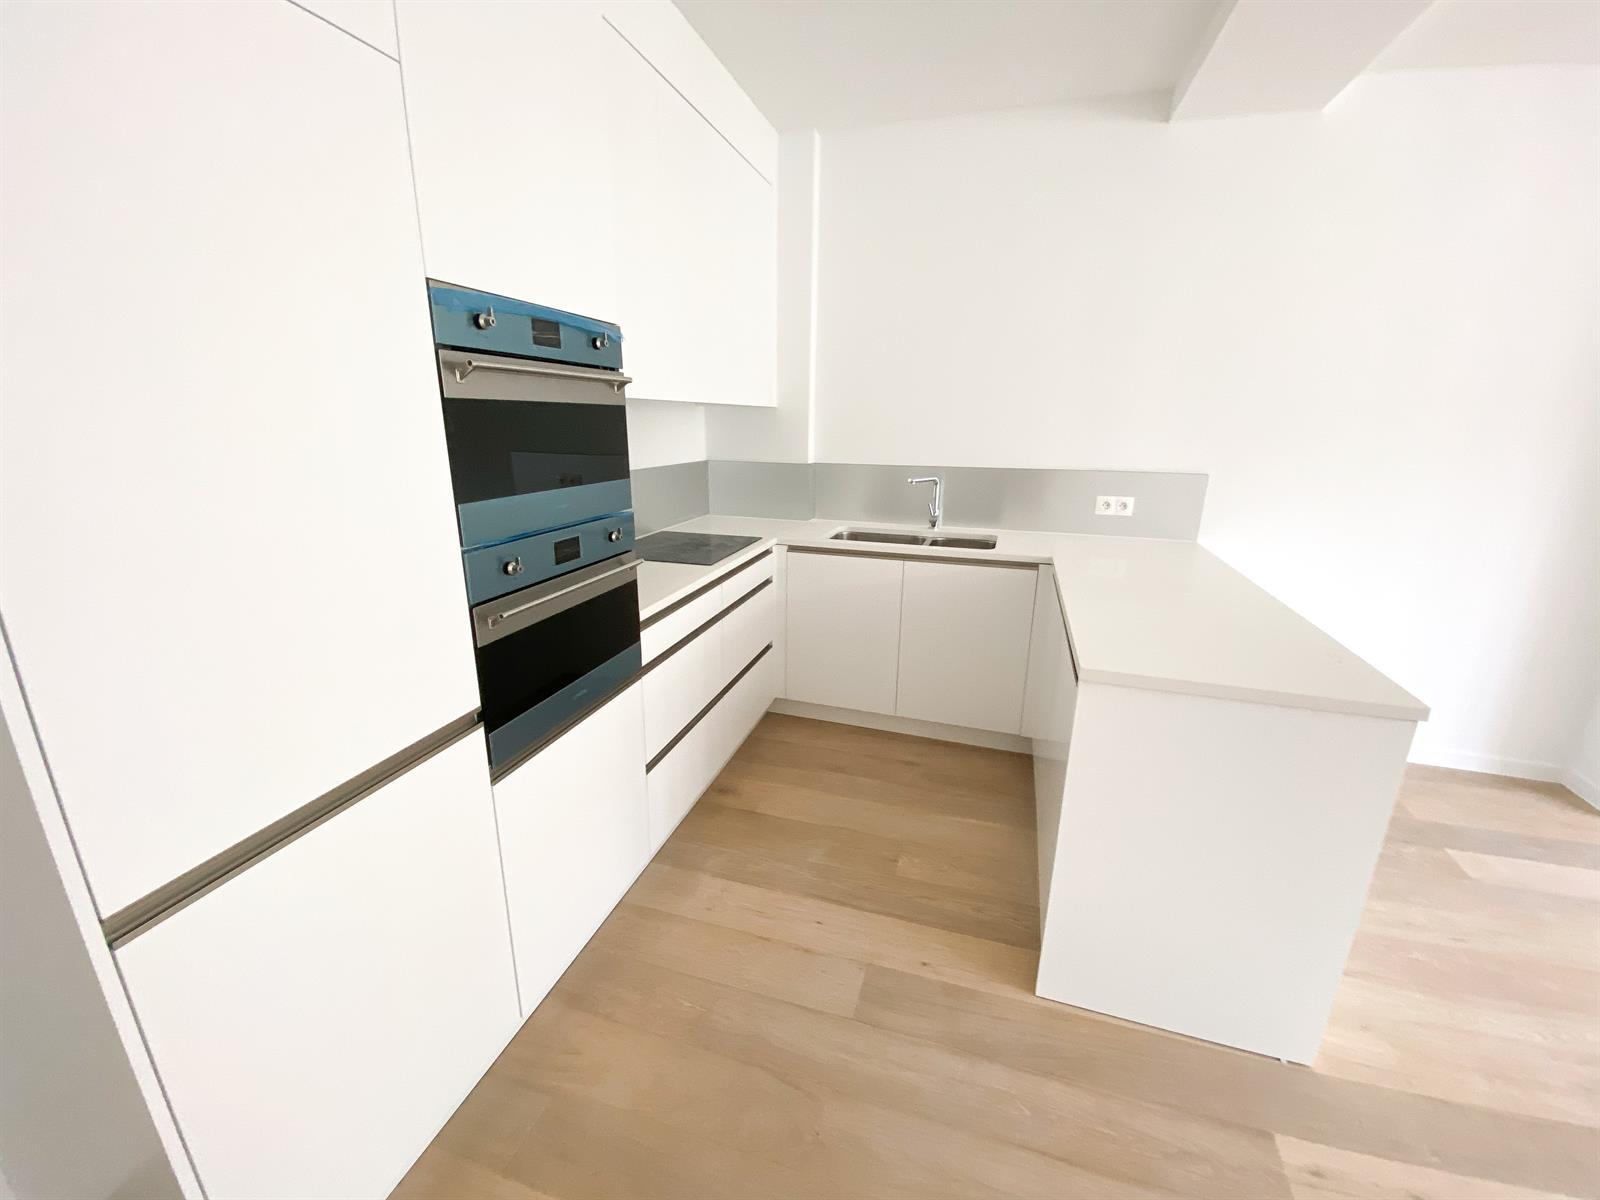 Duplex - Liège - #4045842-6